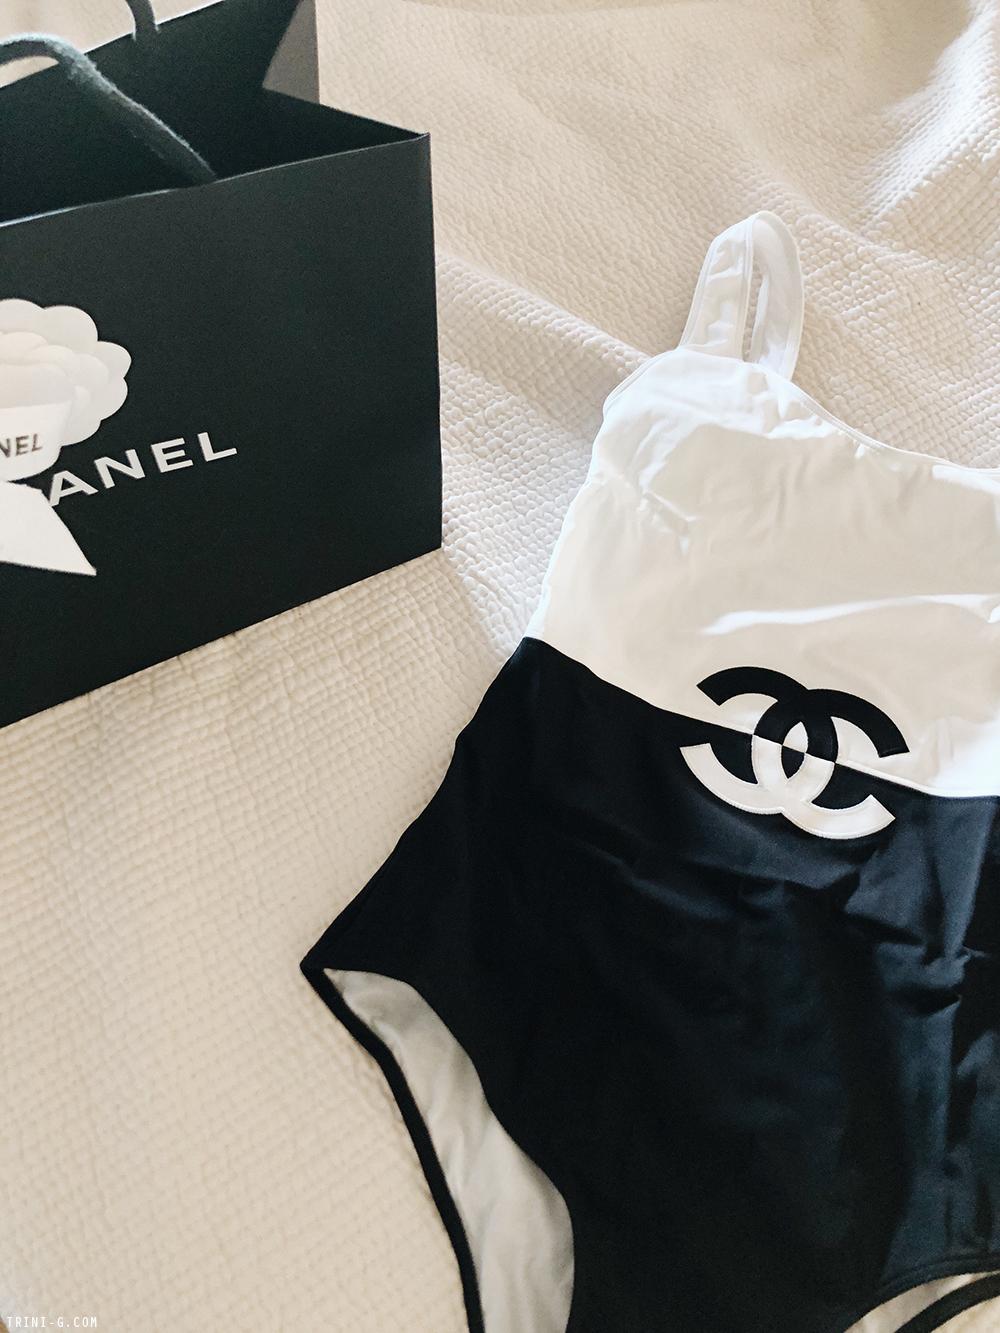 Trini | Chanel swimwear